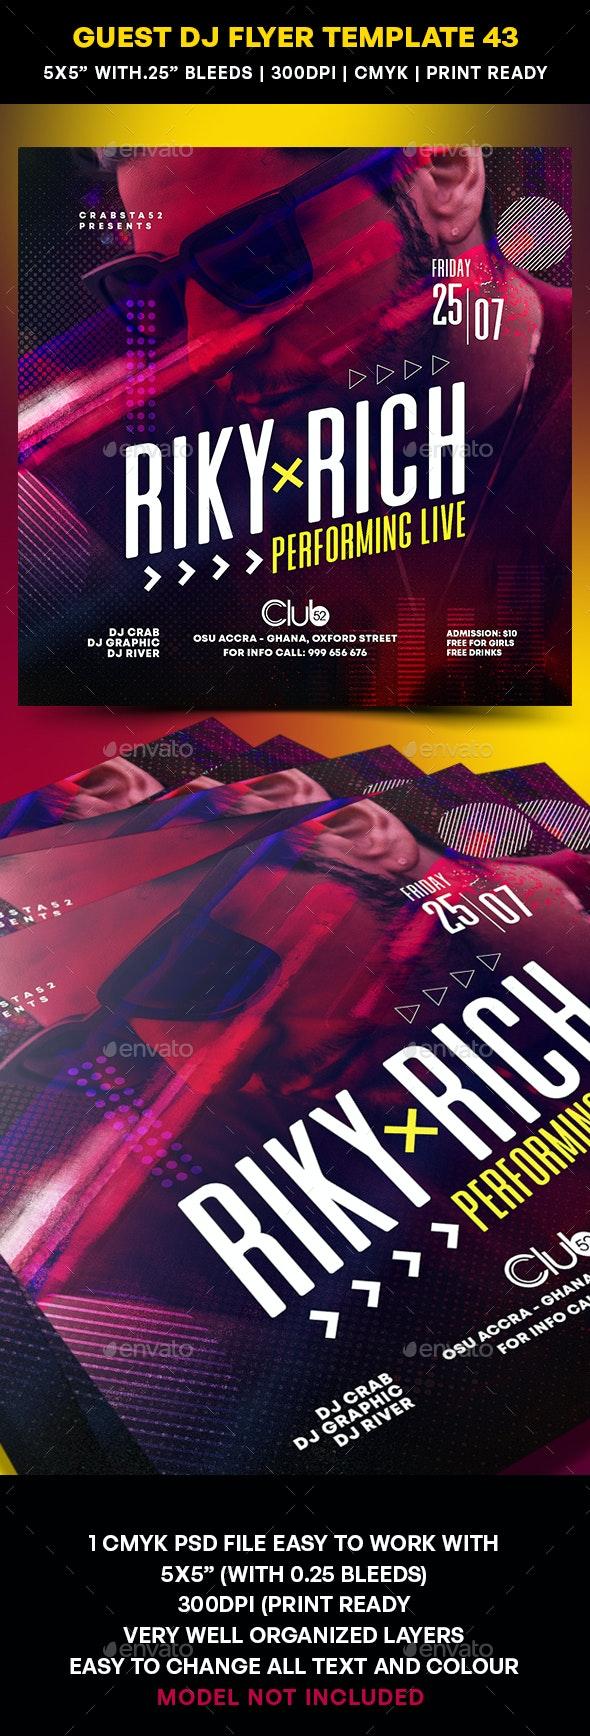 Guest DJ Flyer Template 43 - Clubs & Parties Events